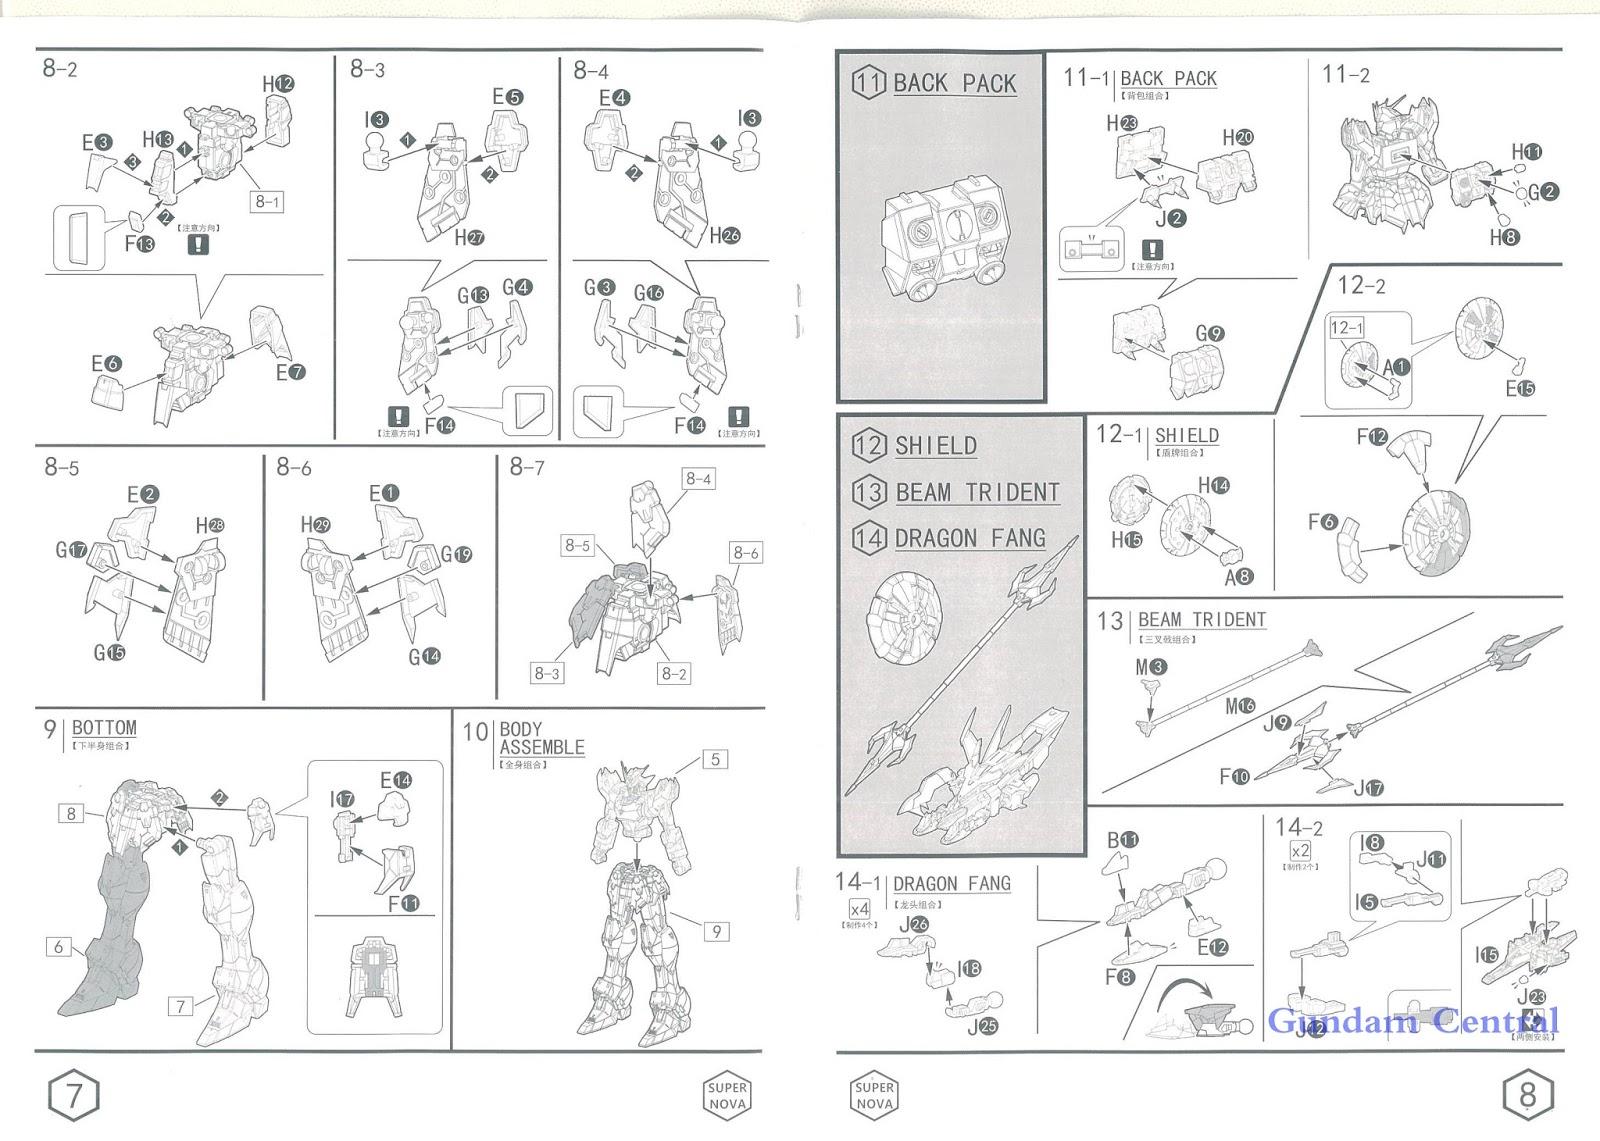 Super Nova: MG 1/100 Gundam Nataku EW ver. Manual and Box